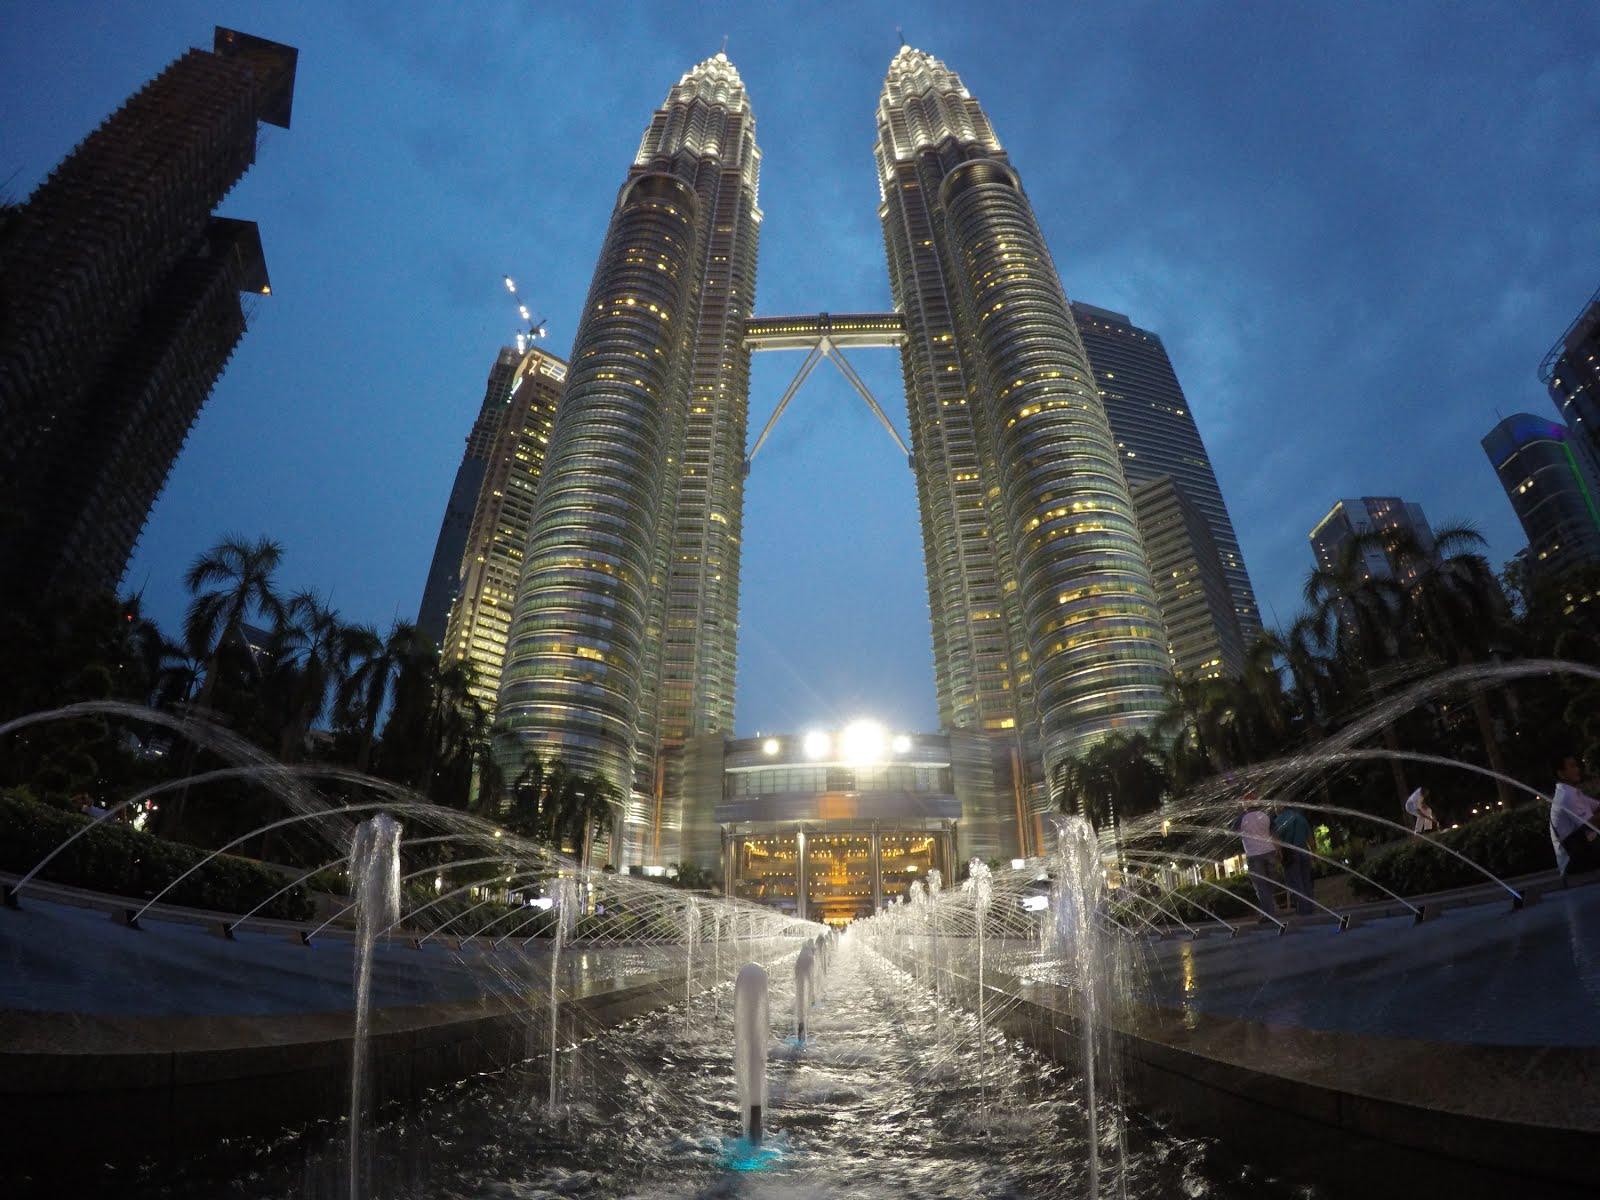 Kuala Lumpur: Roteiro de 1 dia e Meio